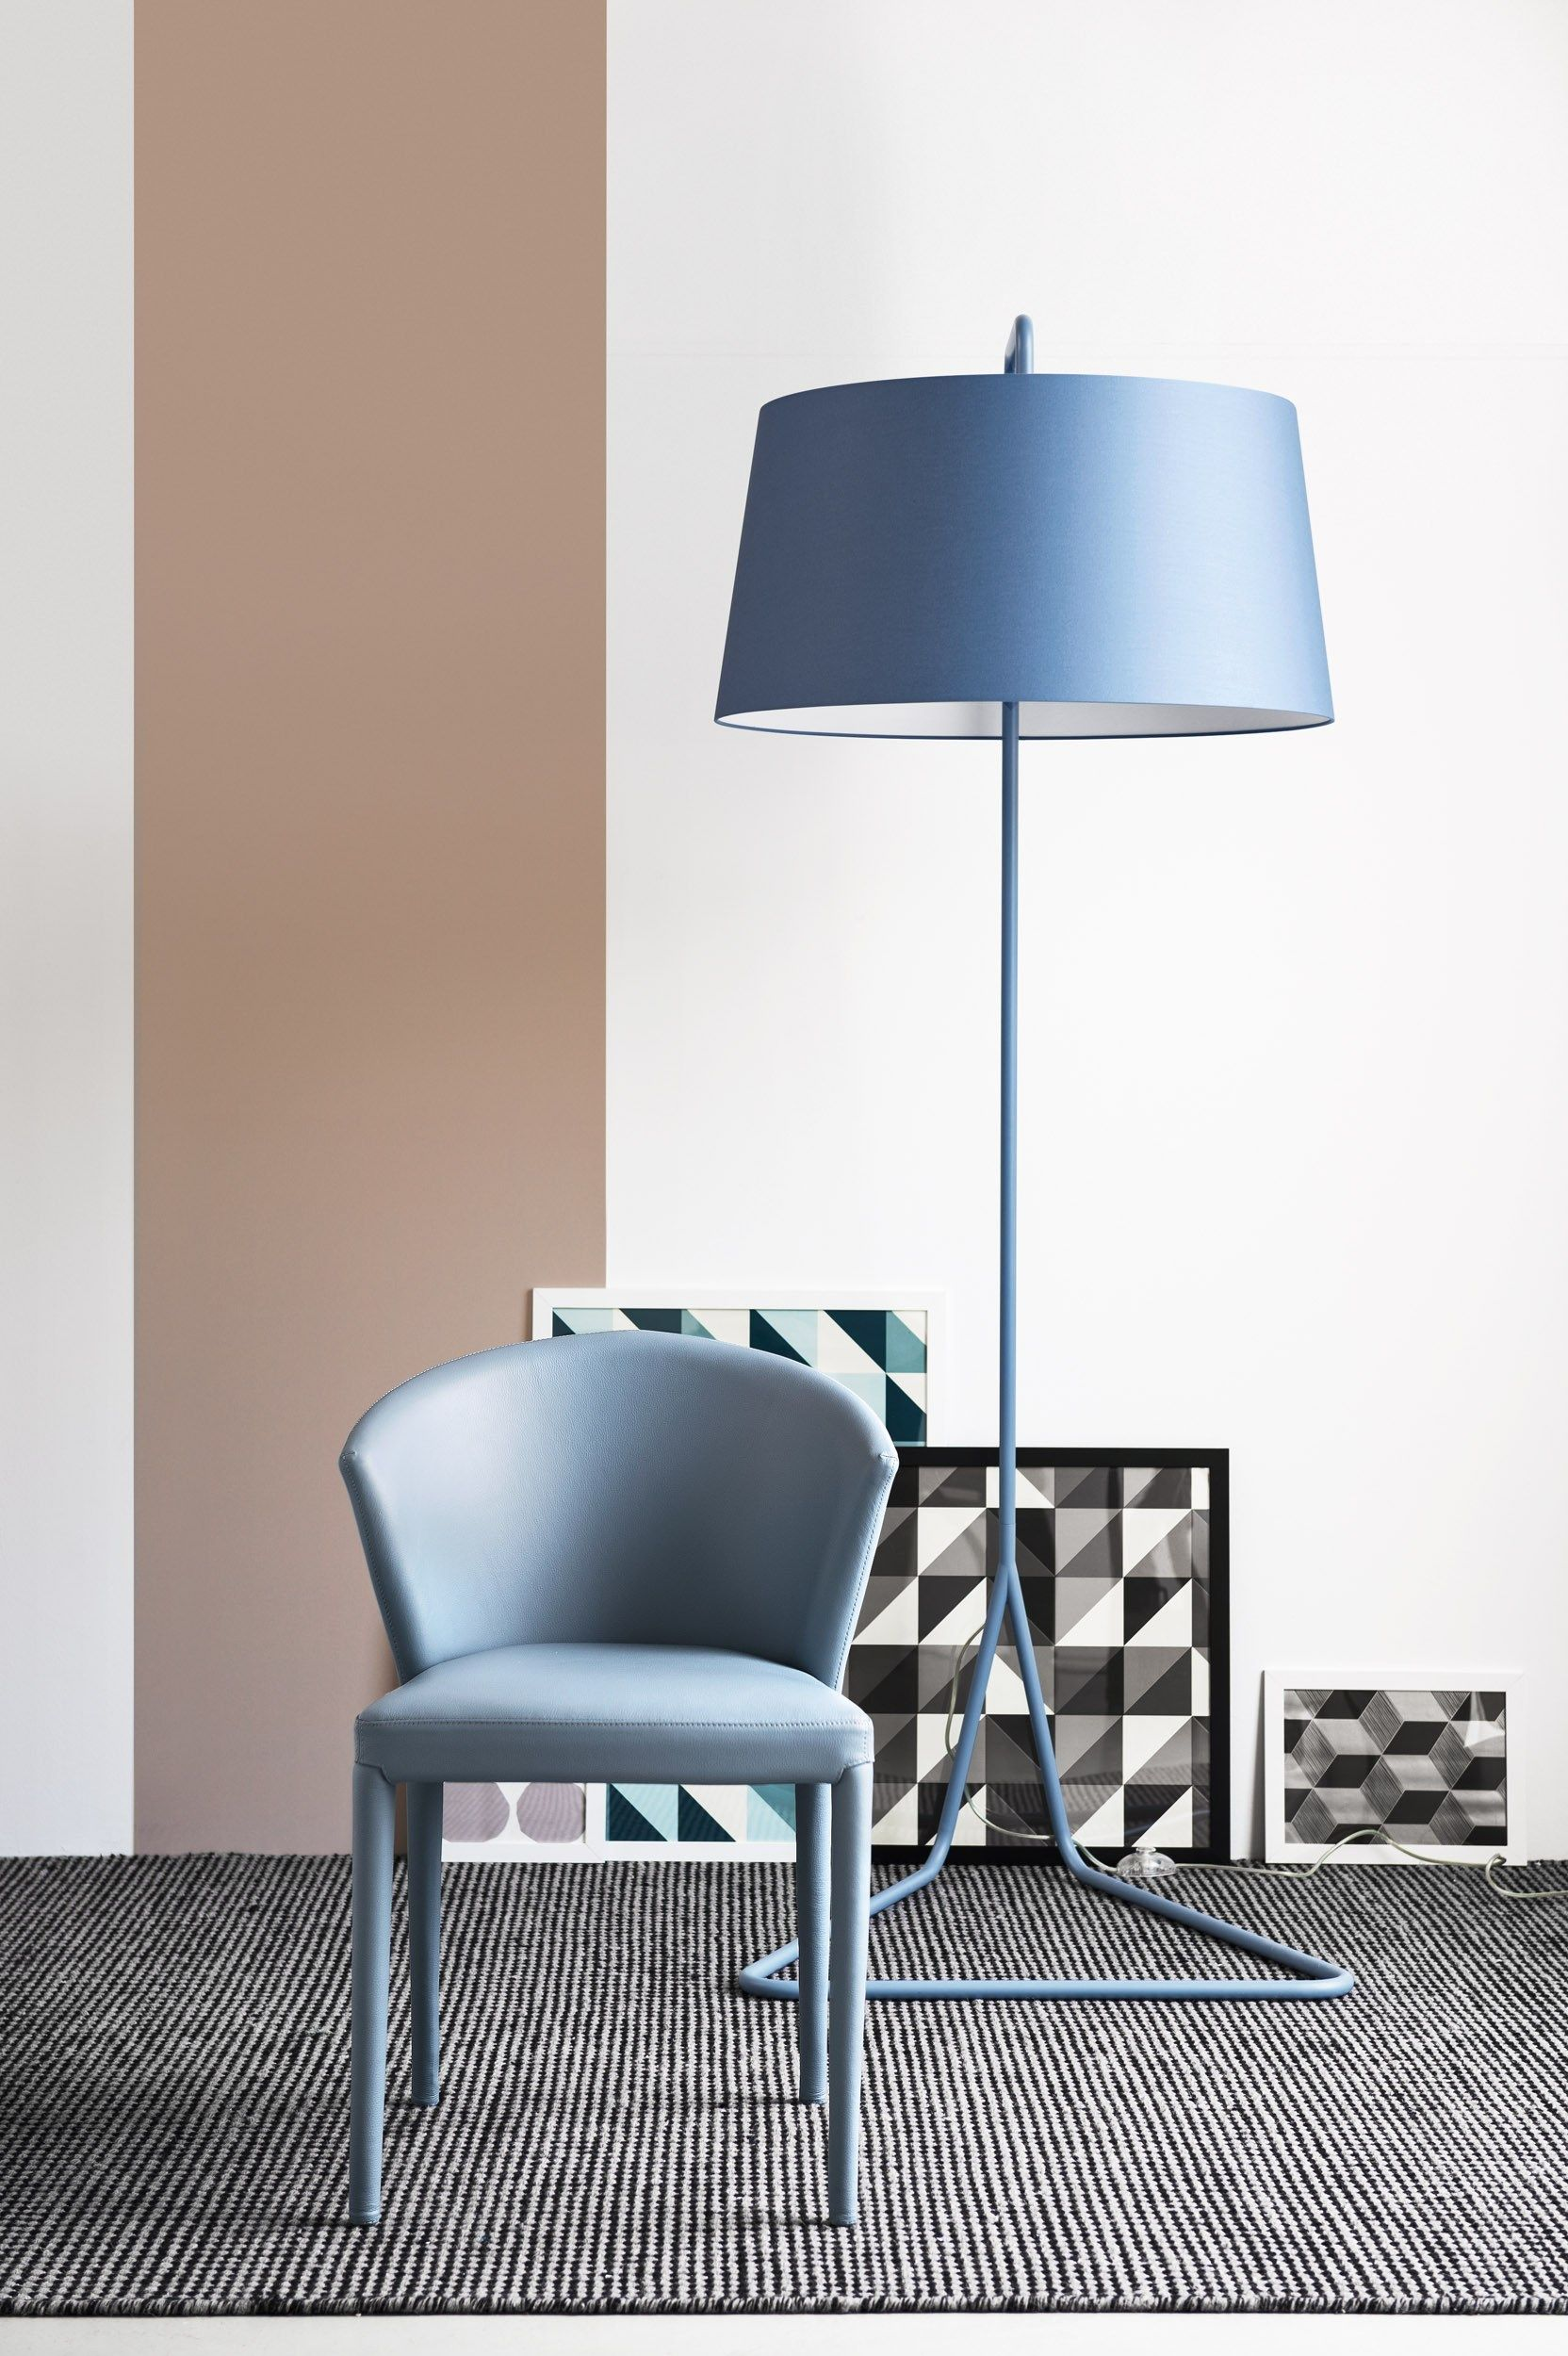 Amelie Leather Chair By Calligaris Design Orlandini Design Hip Furniture Furniture Italian Furniture Modern